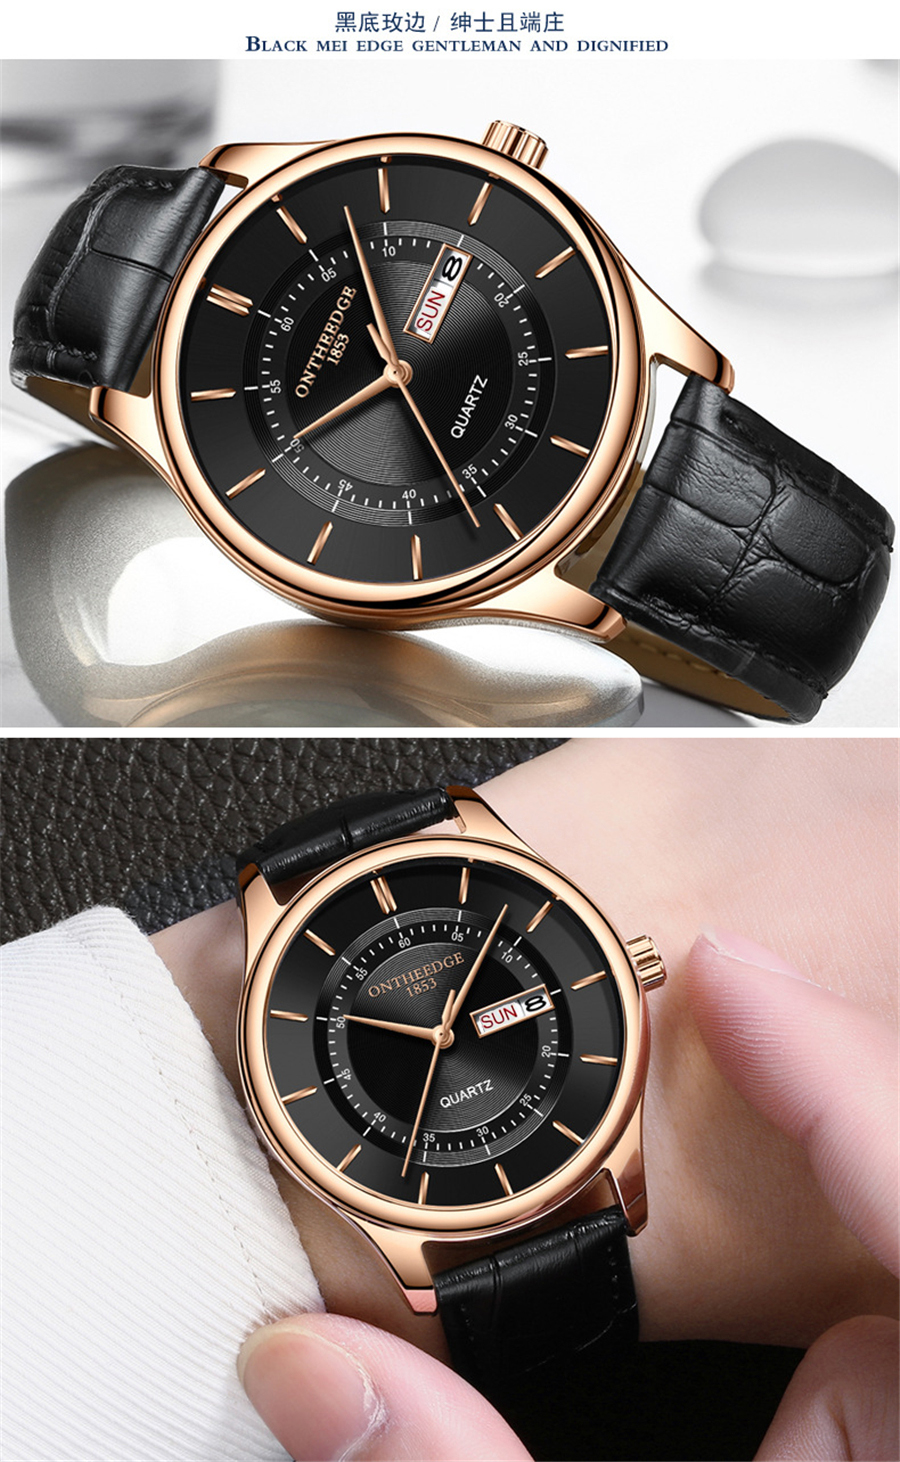 HTB1P9X3i.R1BeNjy0Fmq6z0wVXak High Quality Rose Gold Dial Watch Men Leather Waterproof 30M Watches Business Fashion Japan Quartz Movement Auto Date Male Clock